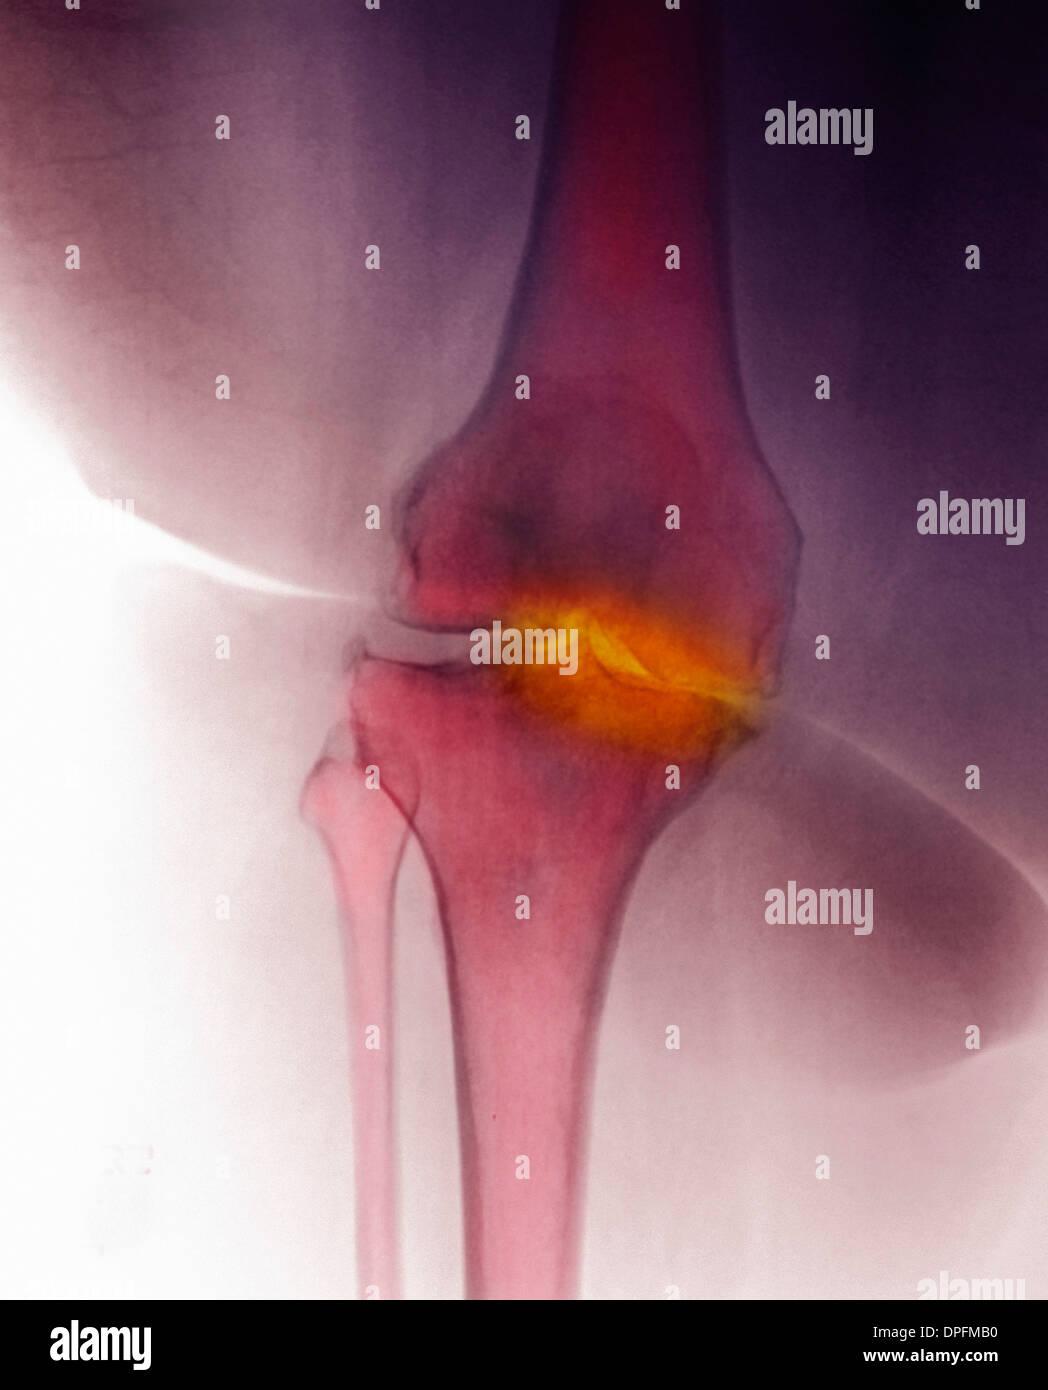 x-ray of knee showing degenerative arthritis - Stock Image